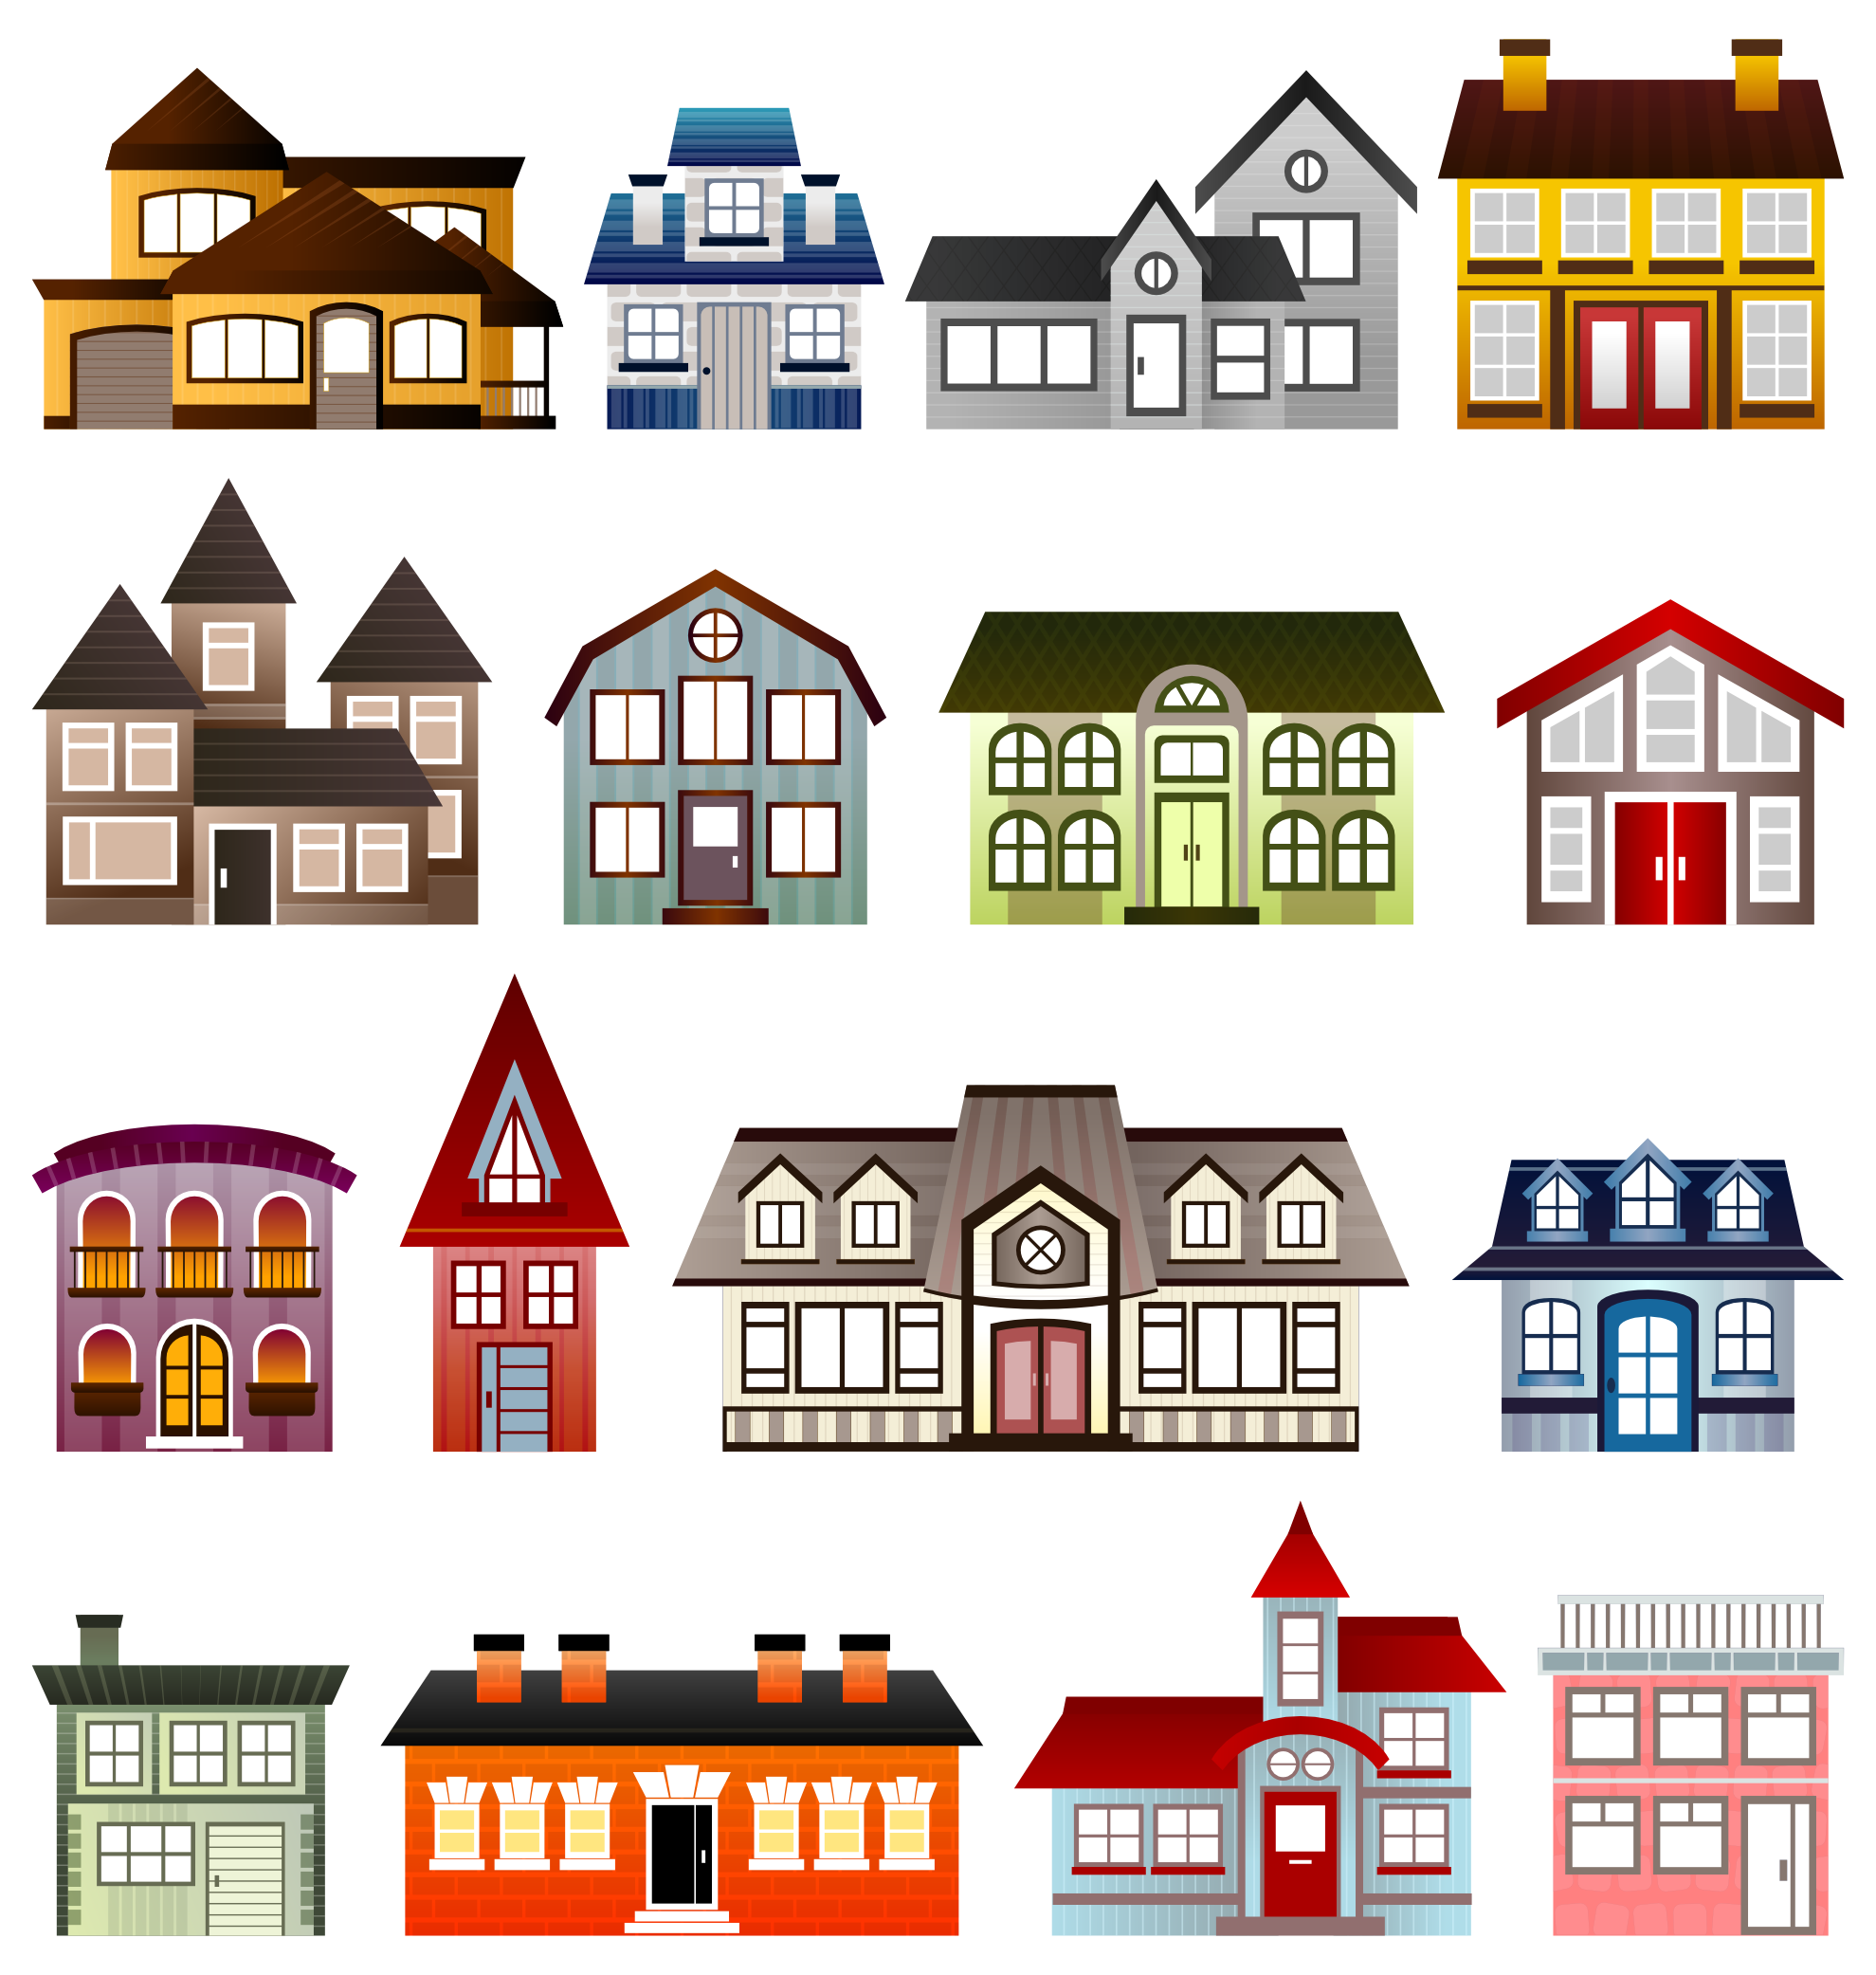 Houses Viscious Speed Scallywag March Clipartist Net Art Clip Art